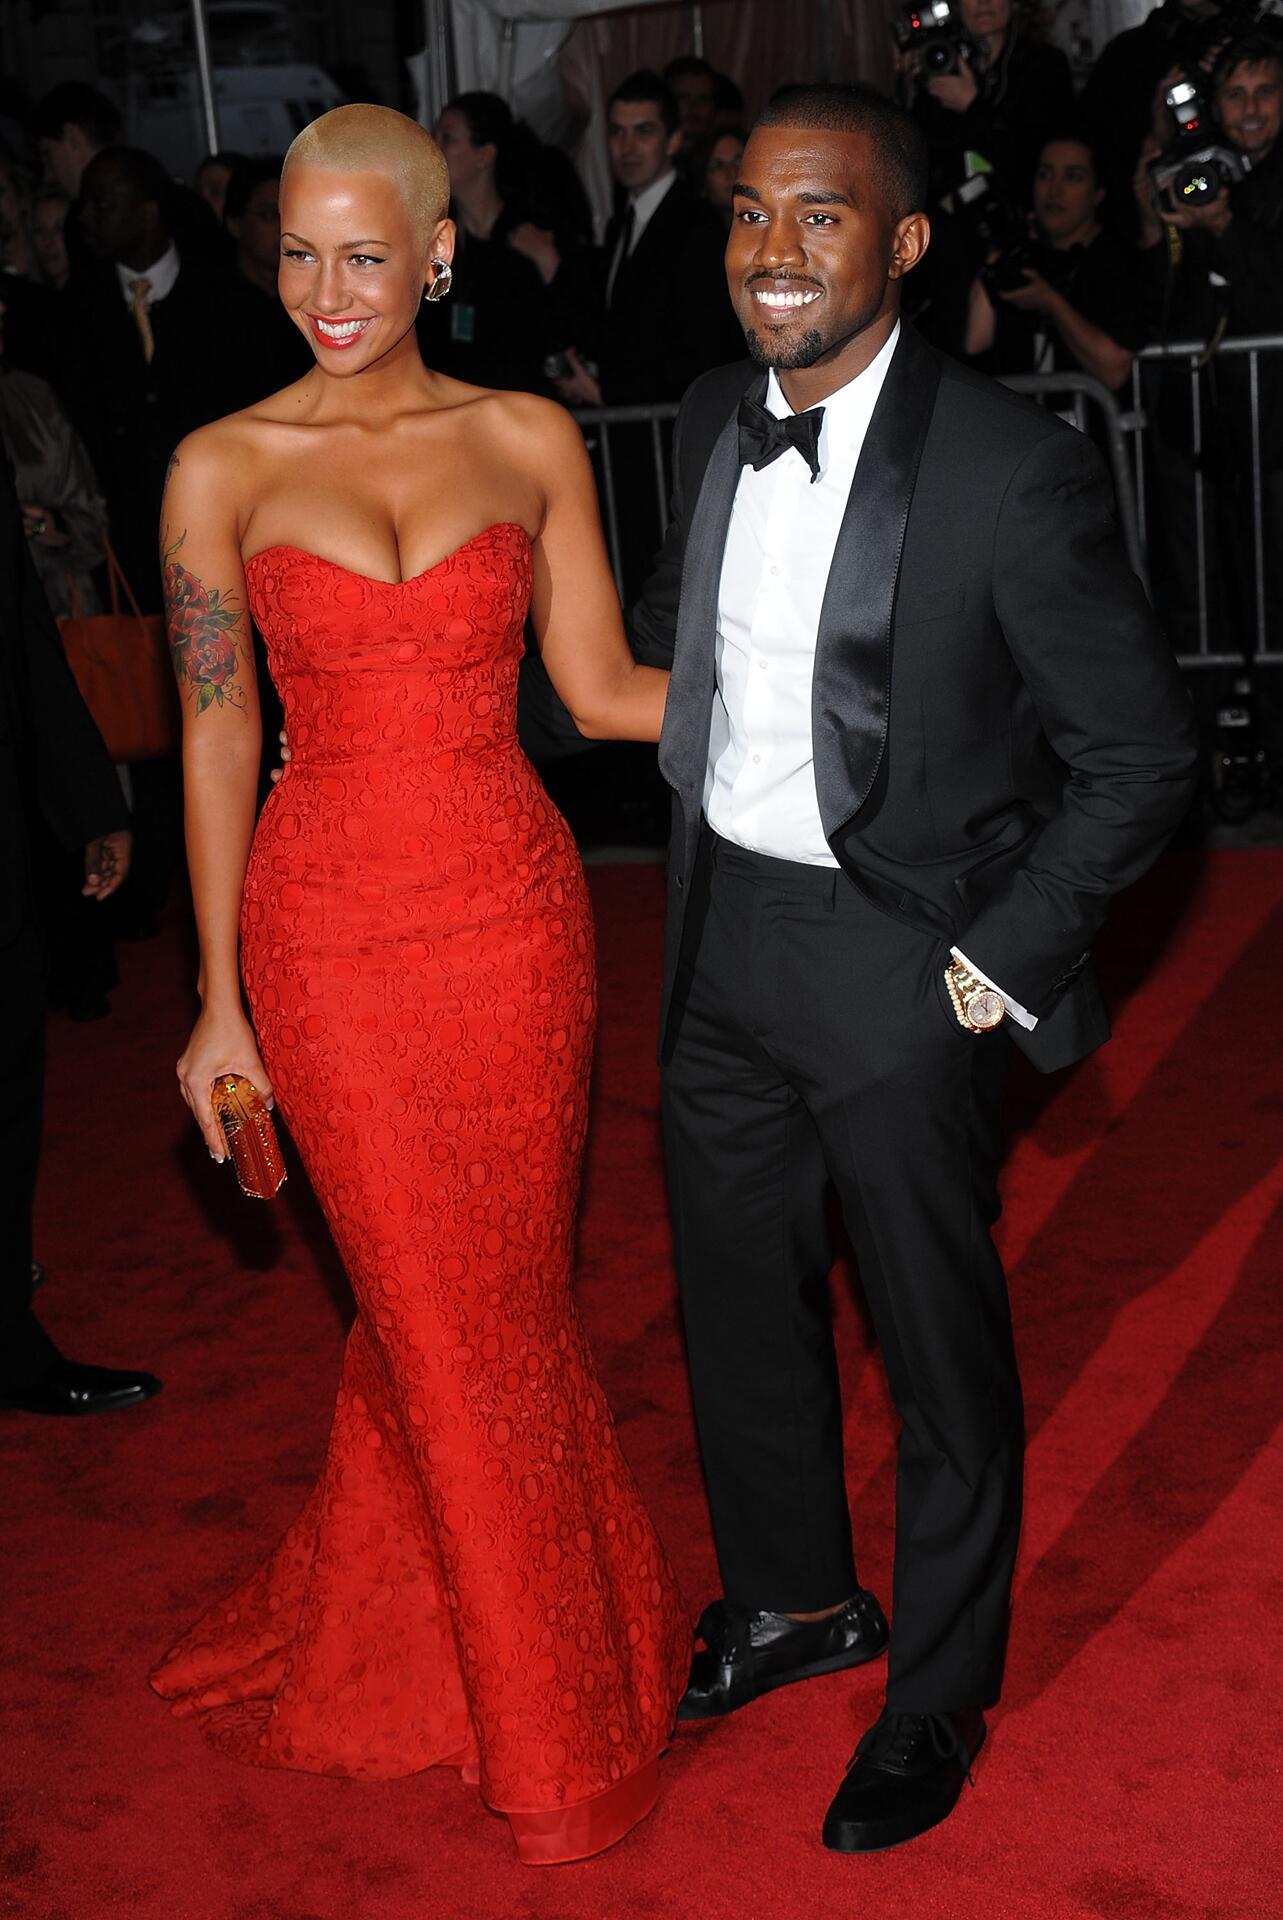 Bild zu Amber Rose, Kanye West